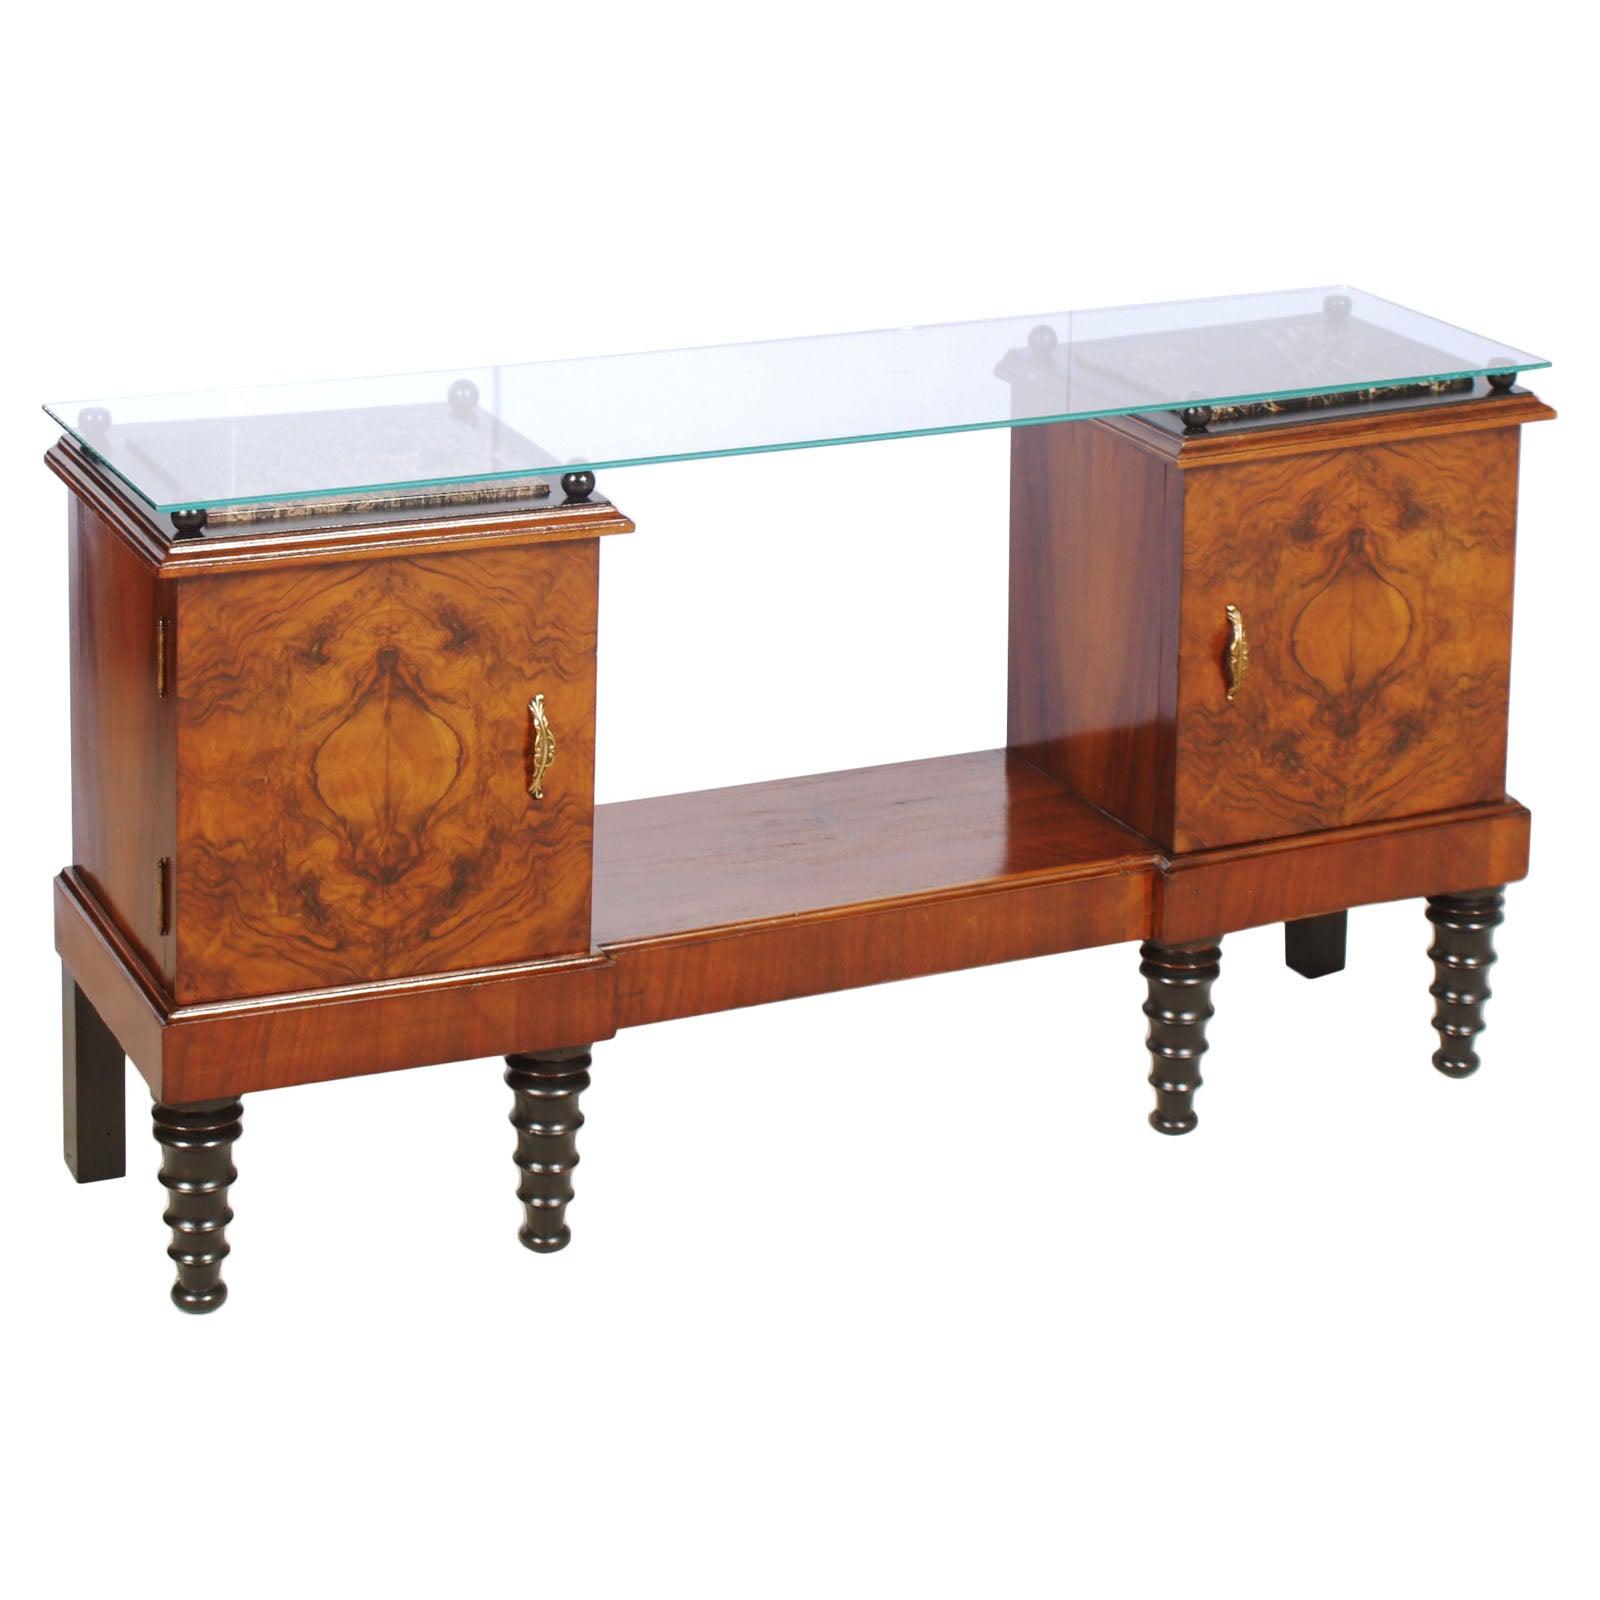 Console Art Deco, entrance cabinet, in burl walnut and ebonized walnut.